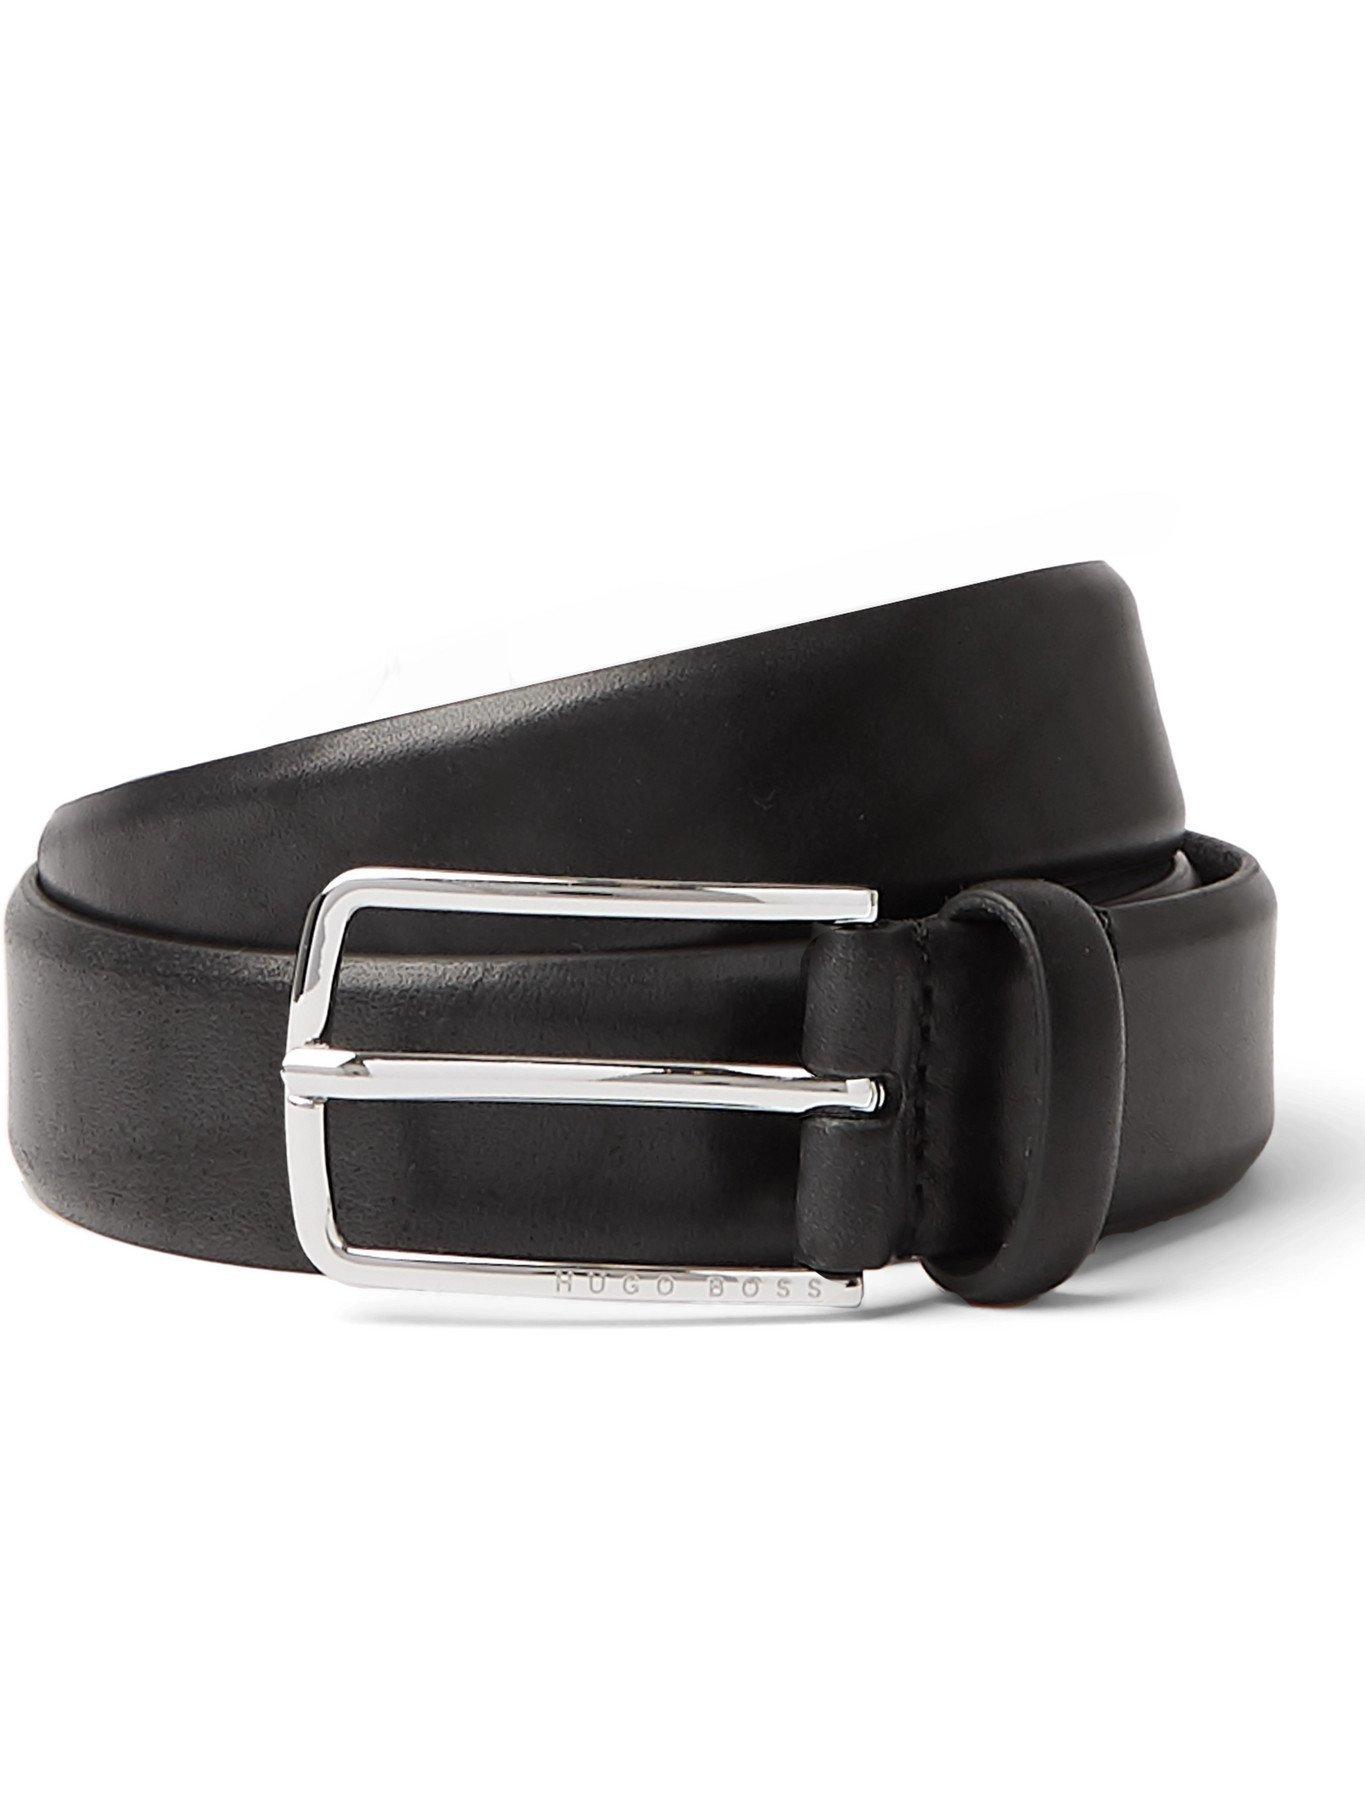 HUGO BOSS - 3cm Leather Belt - Black - EU 95